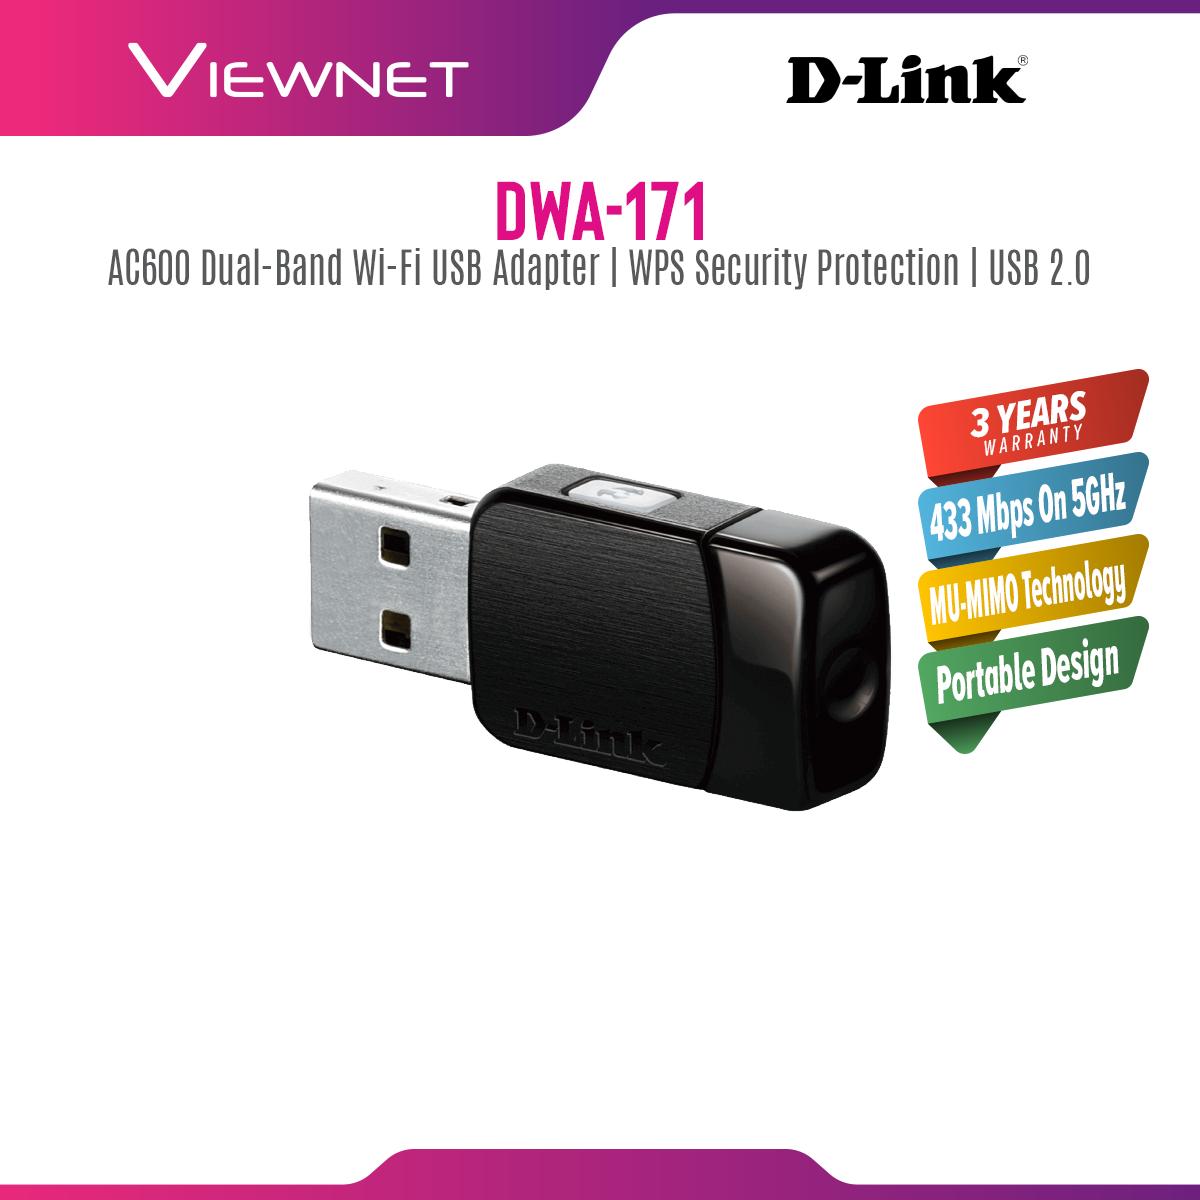 D-Link DWA-171 Wireless AC 750Mbps Dual-Band USB Adapter (MiNi Size)